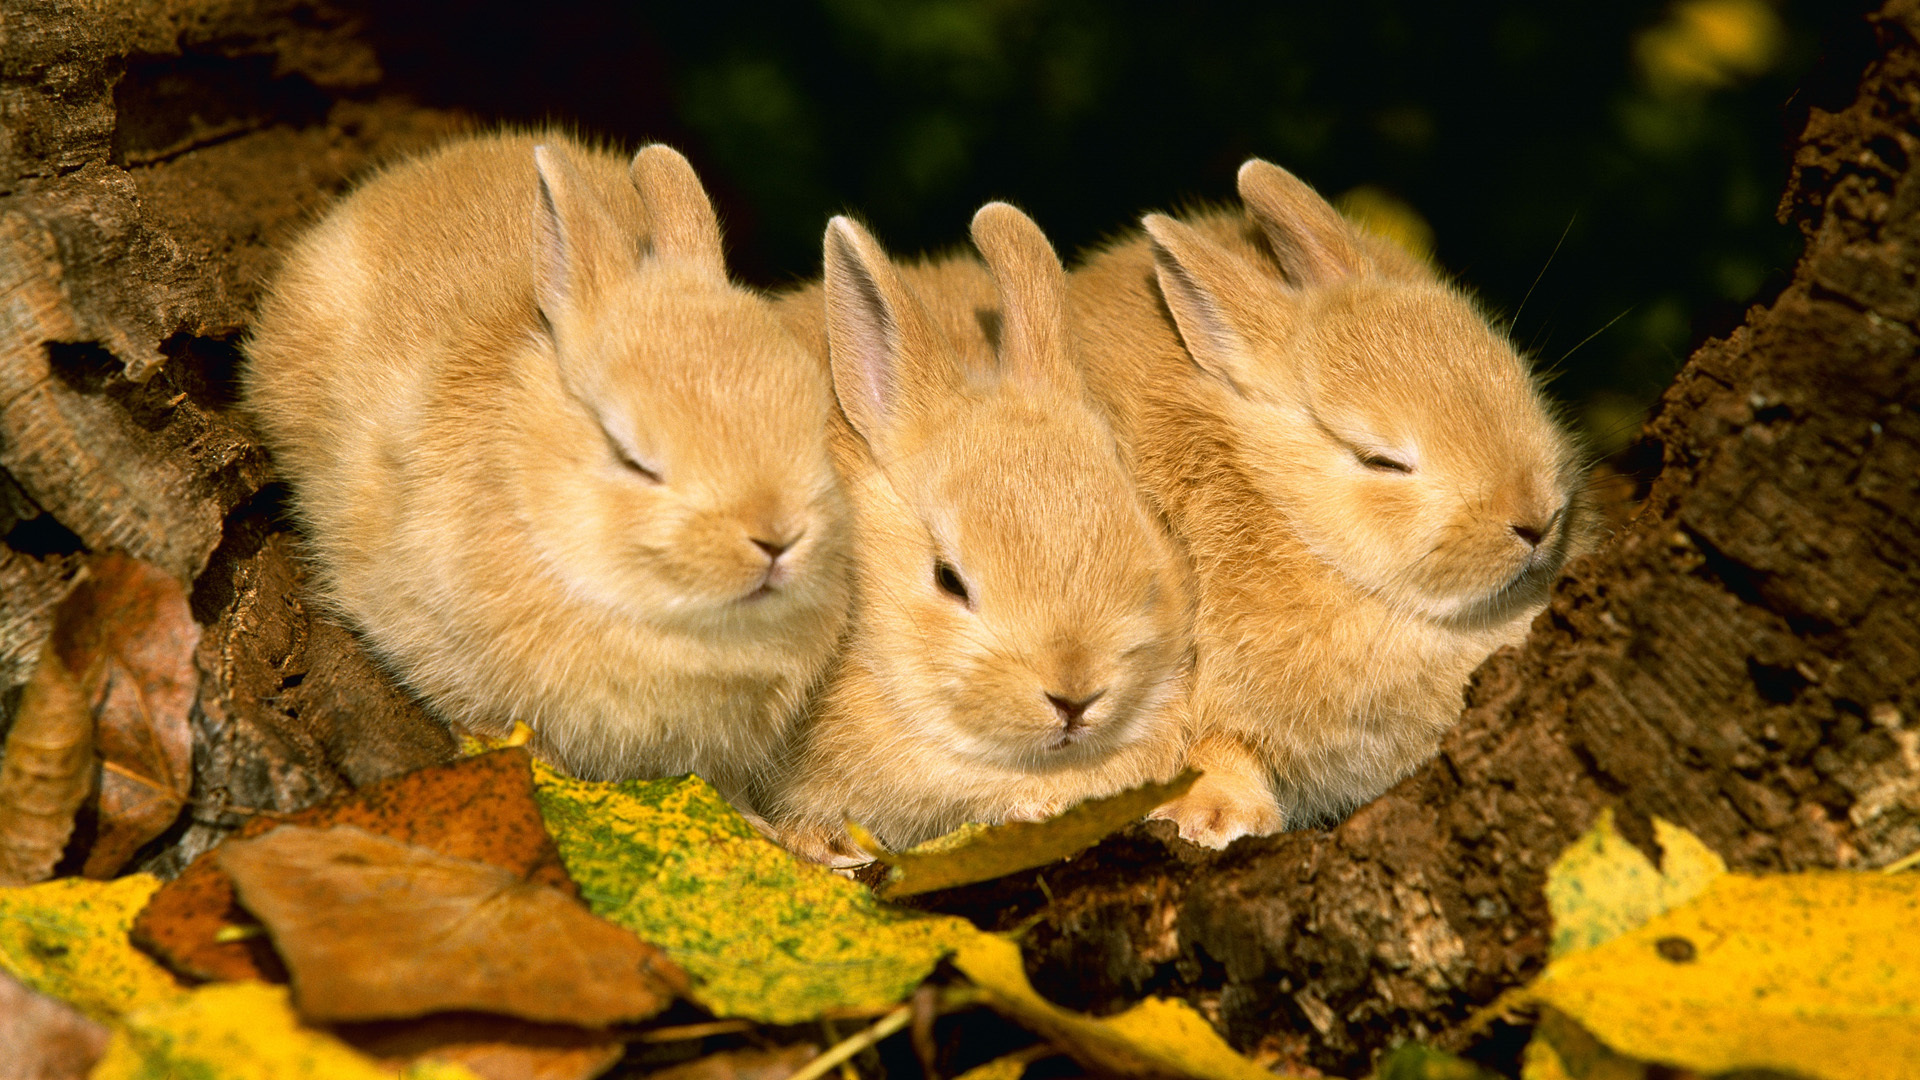 кролик девушка природа животное бесплатно